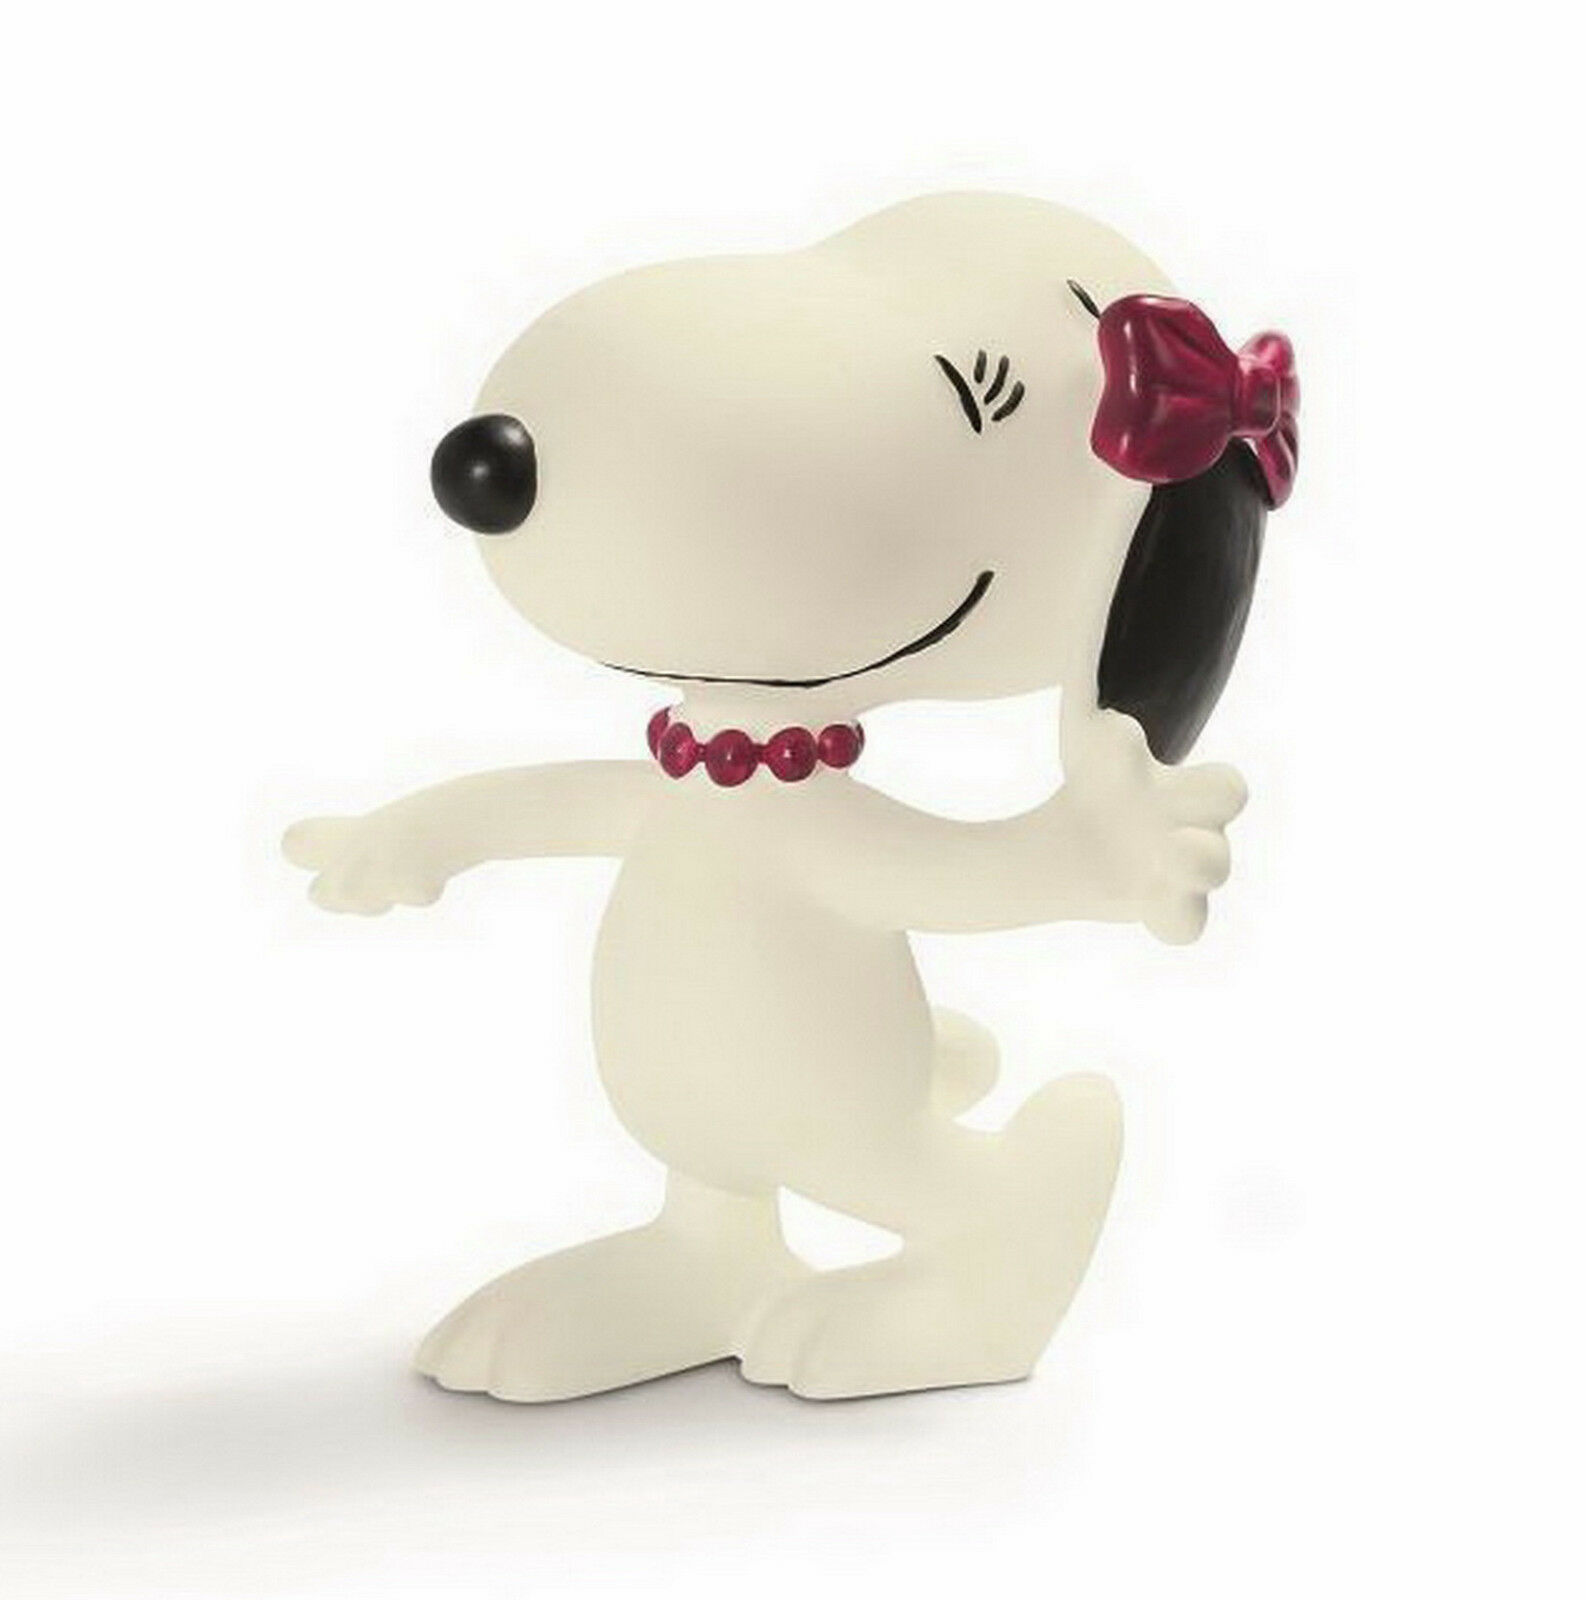 Pvc figurine bd snoopy peanut schleich belle with tea pot cow girl